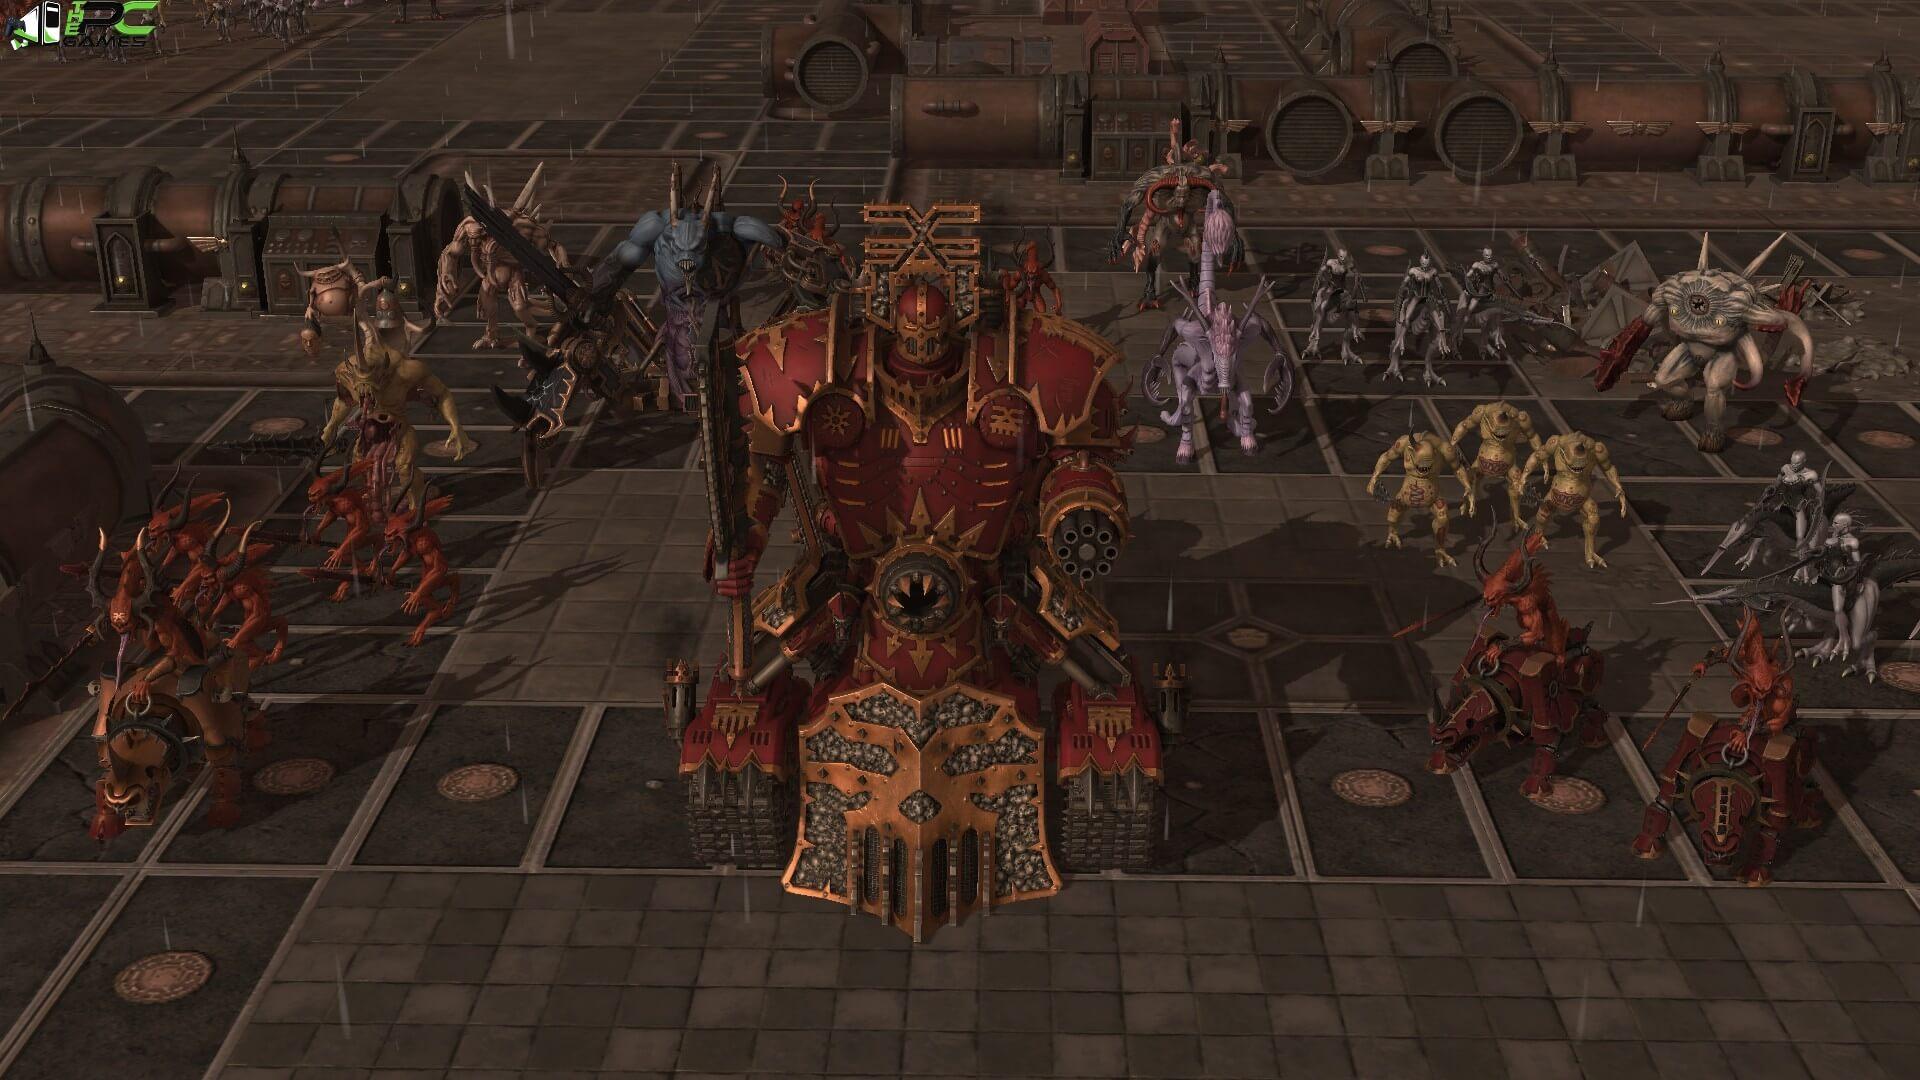 Fall Stars Wallpaper Warhammer 40000 Sanctus Reach Horrors Of The Warp Free